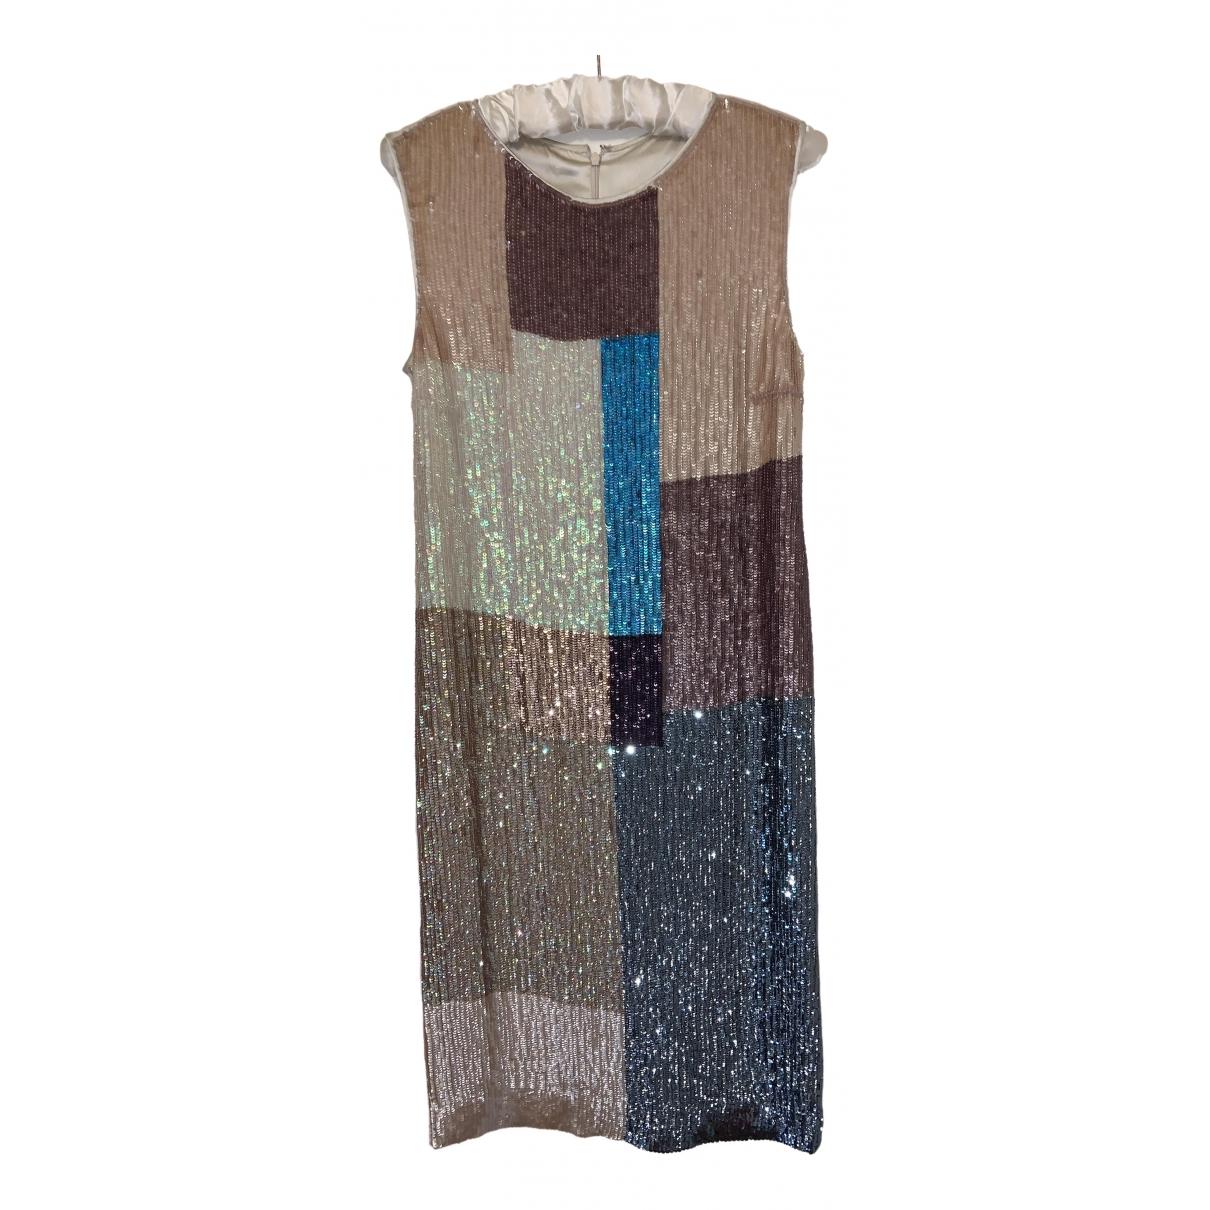 Megan Park \N Beige Silk dress for Women 1 US